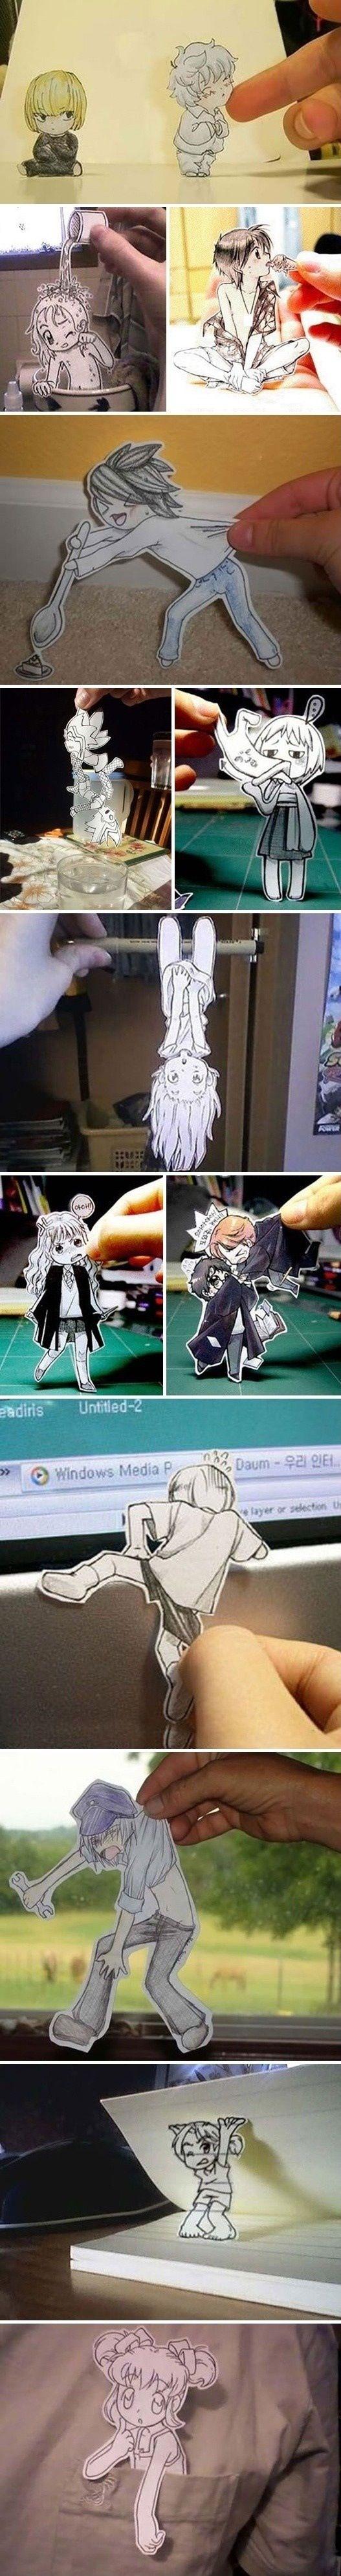 Anime cutouts, I wanna to thing. Need to work on my art skills.